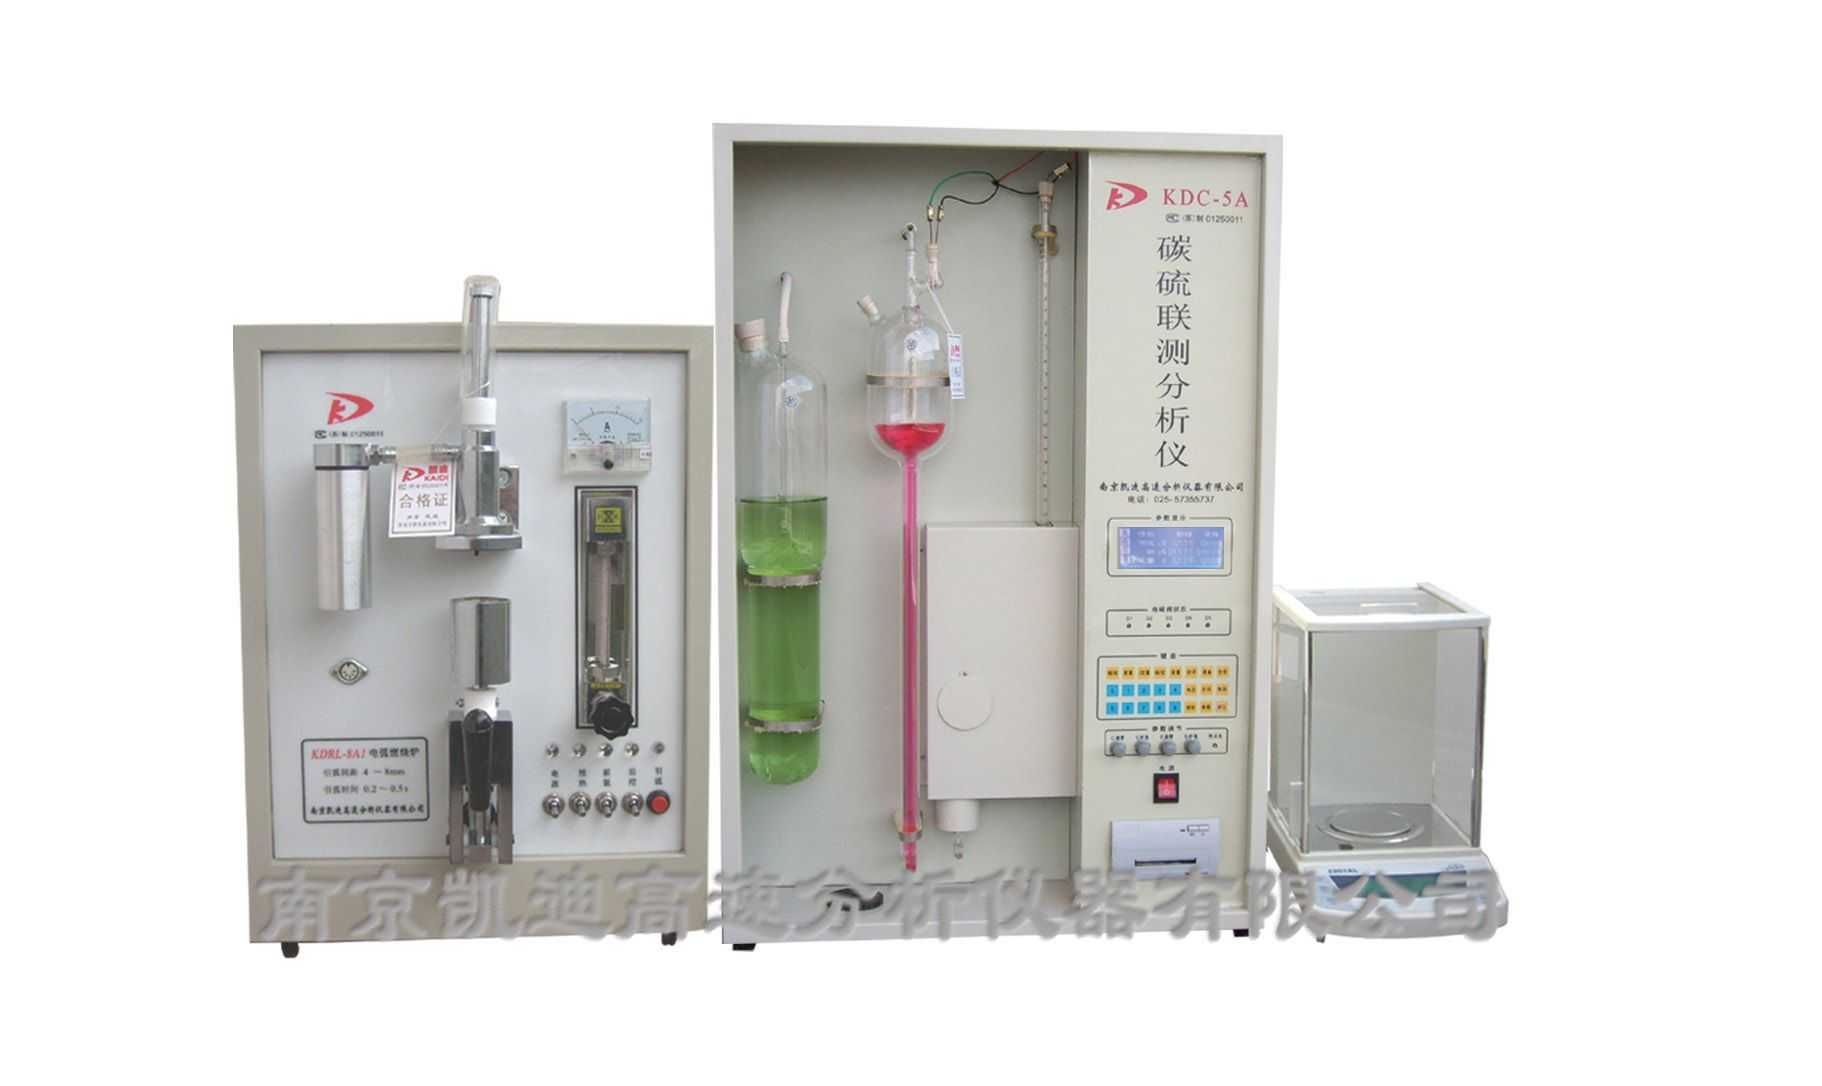 KDC-5A铸造用碳硫分析仪